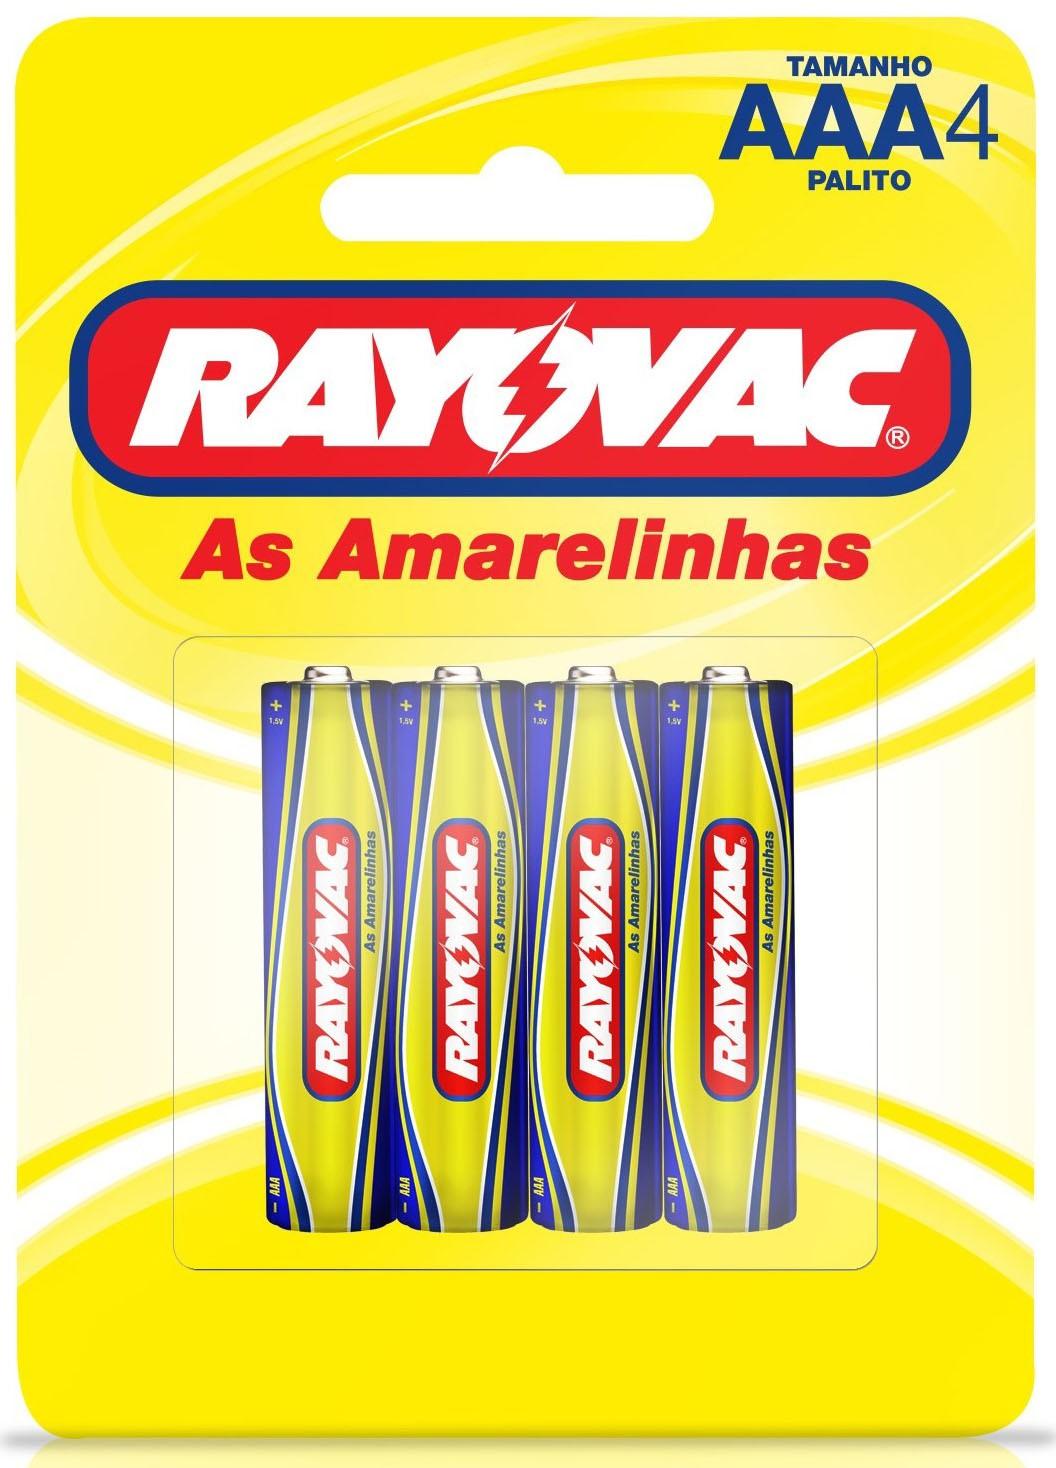 60 Pilhas AAA Zinco Carvão RAYOVAC 15 cartelas